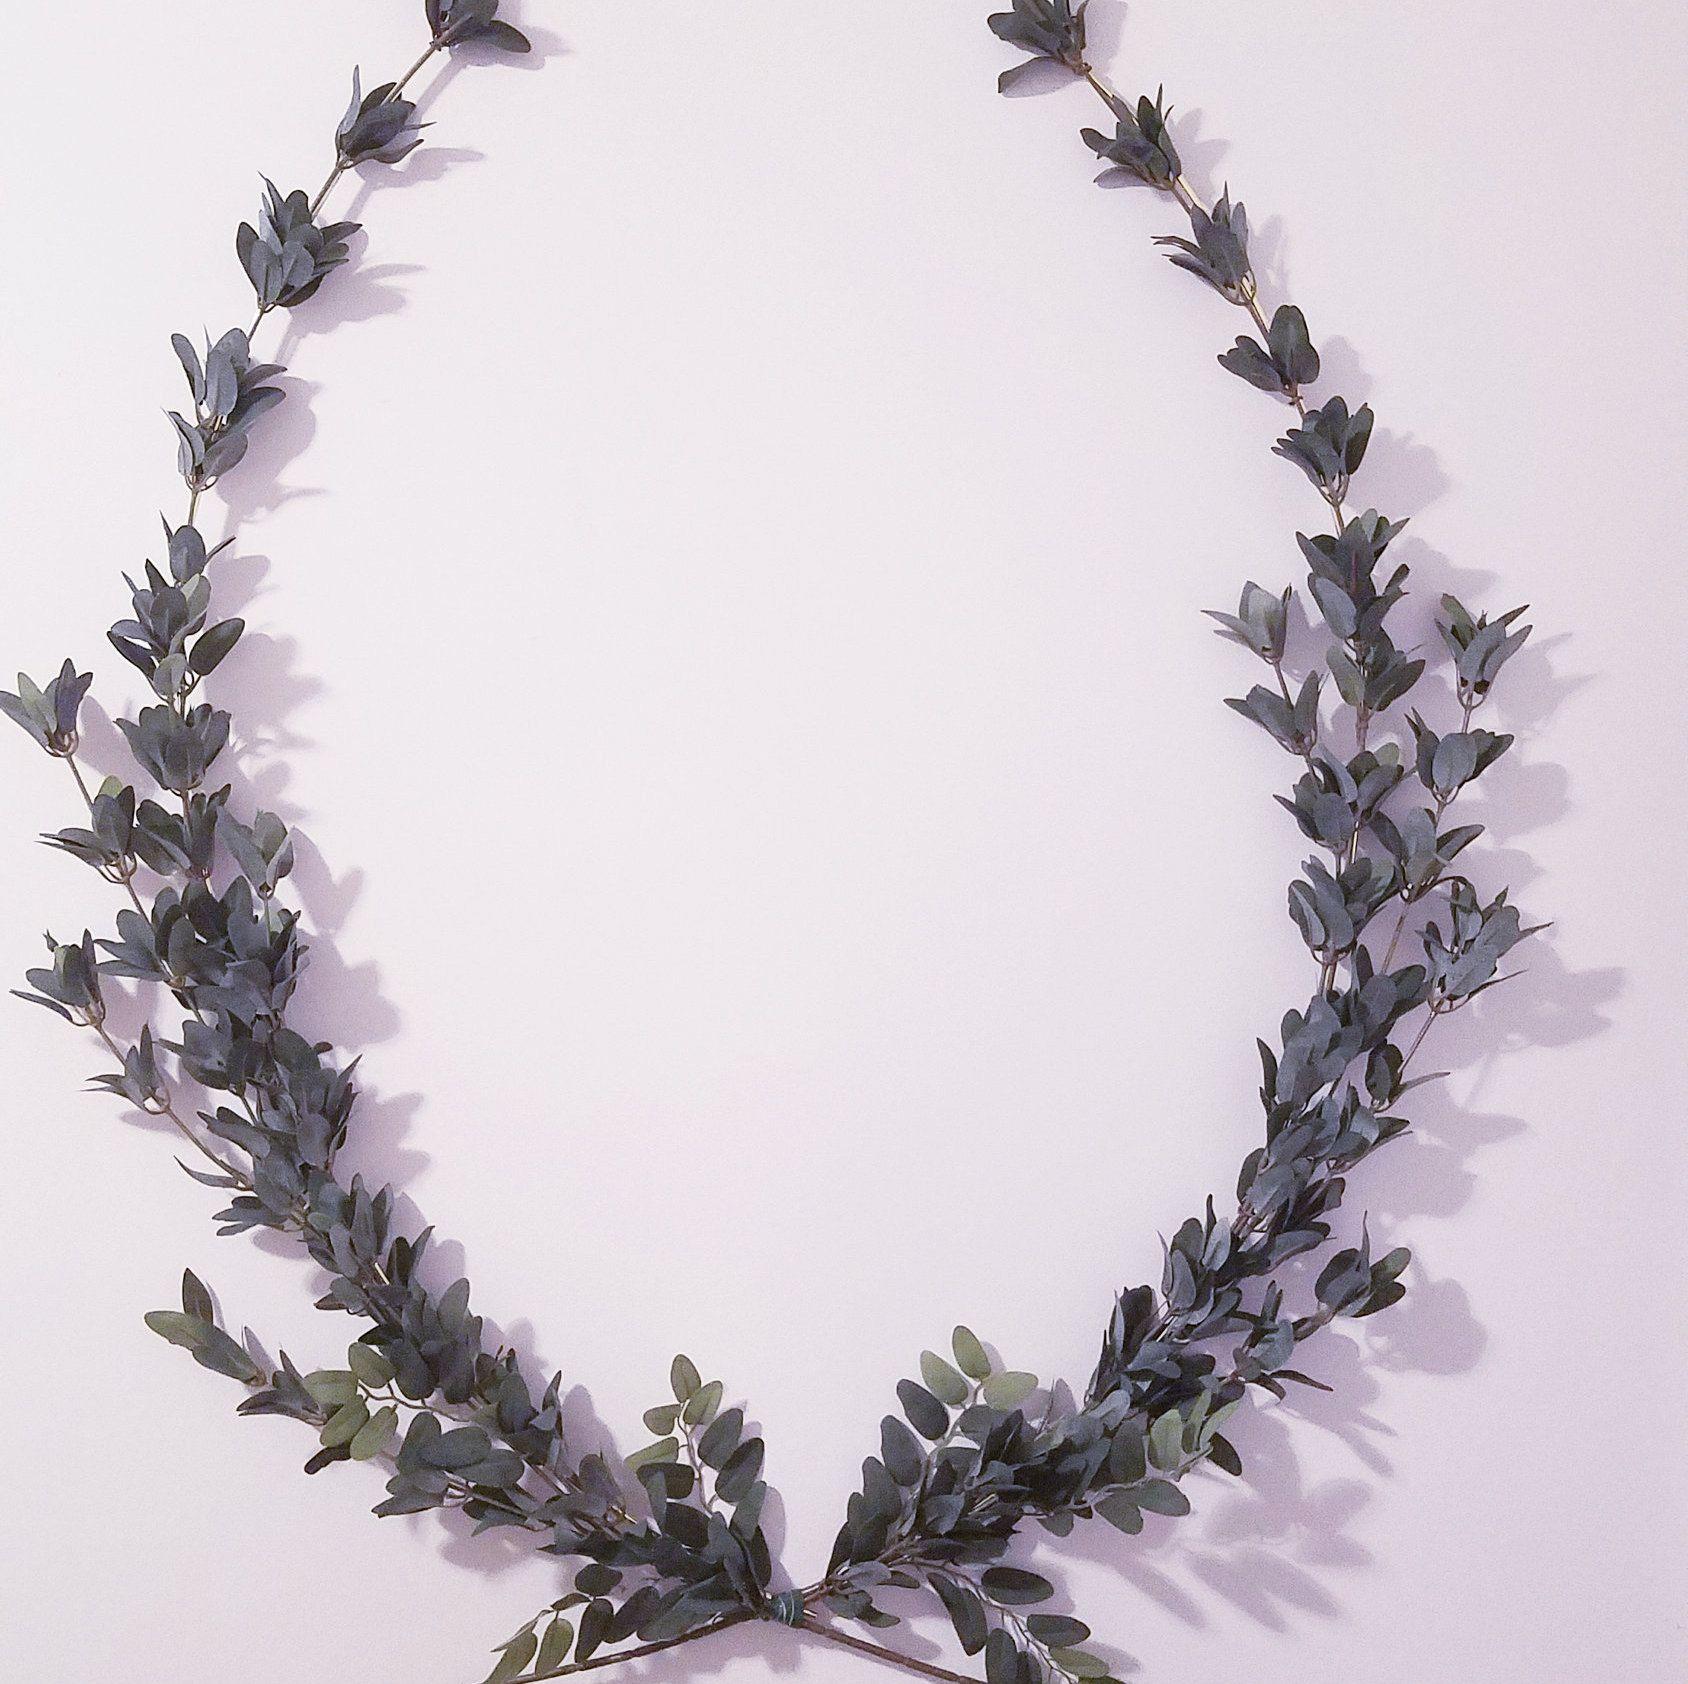 Photo of Laurel Wreath, Unique Indoor Wreath, 32 inch Nursery Wreath, Minimalist Wreath